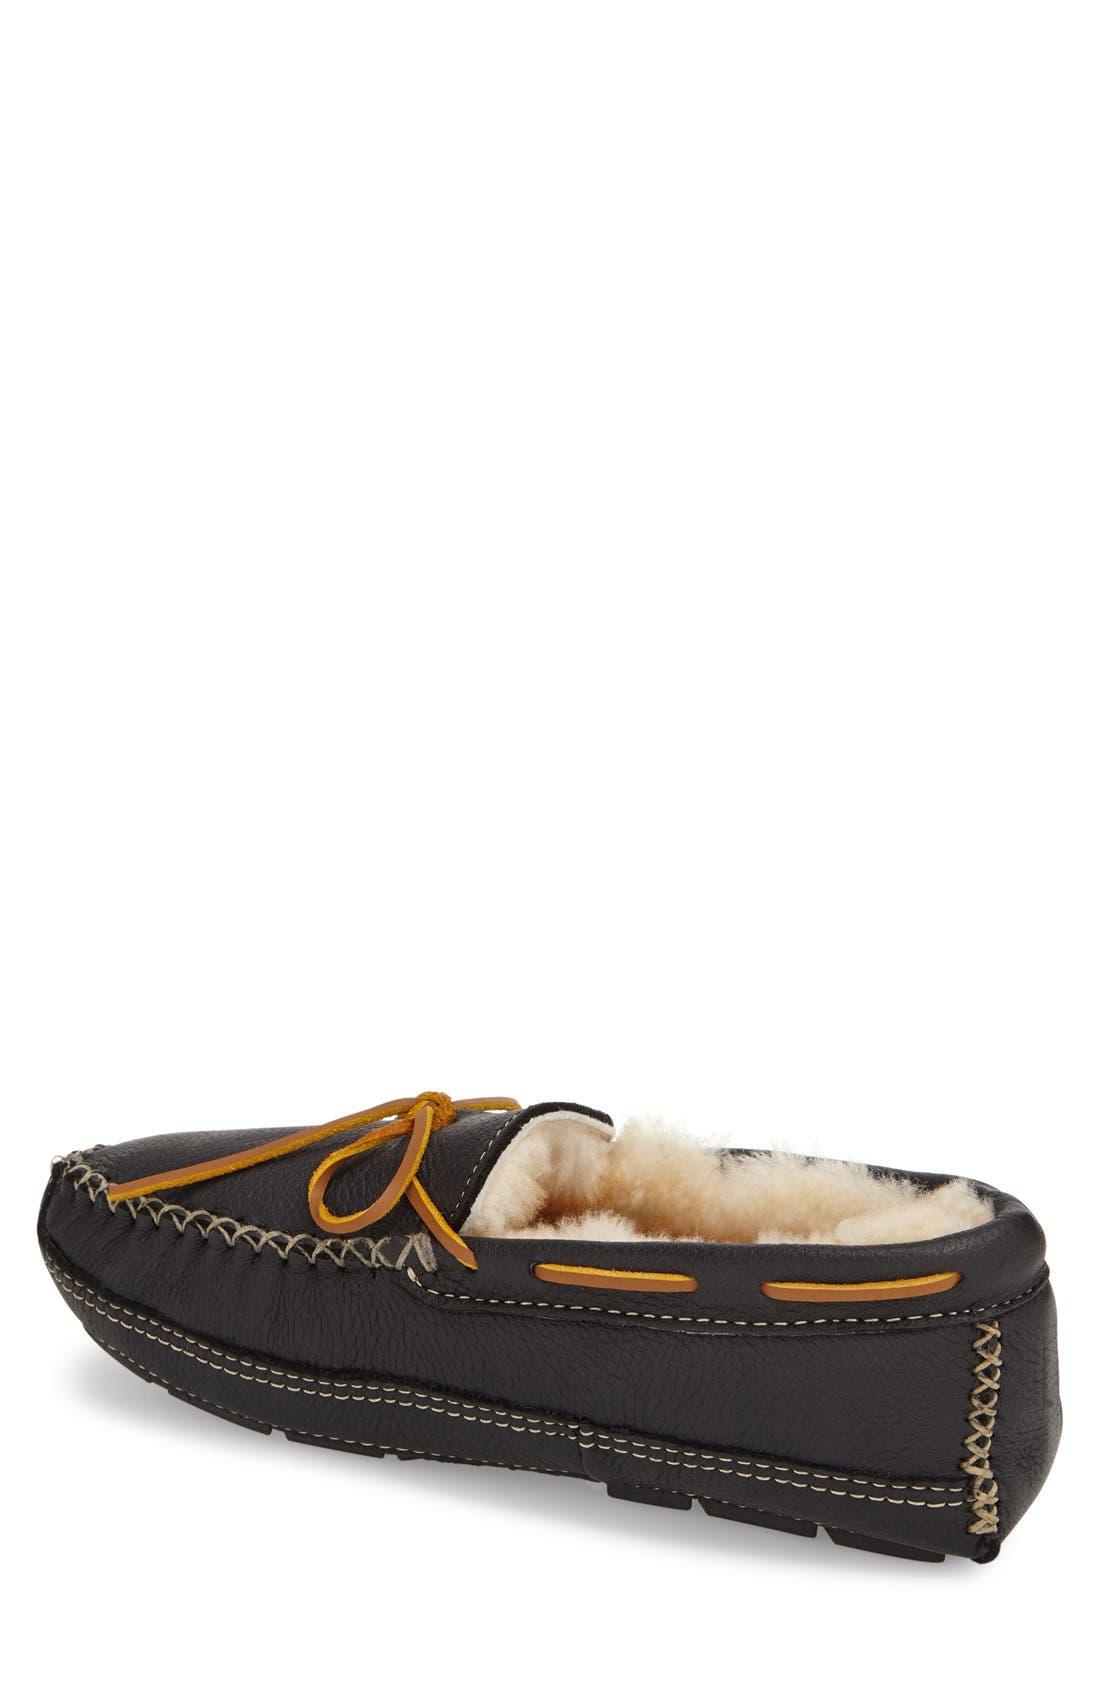 Genuine Shearling Leather Slipper,                             Alternate thumbnail 2, color,                             Black